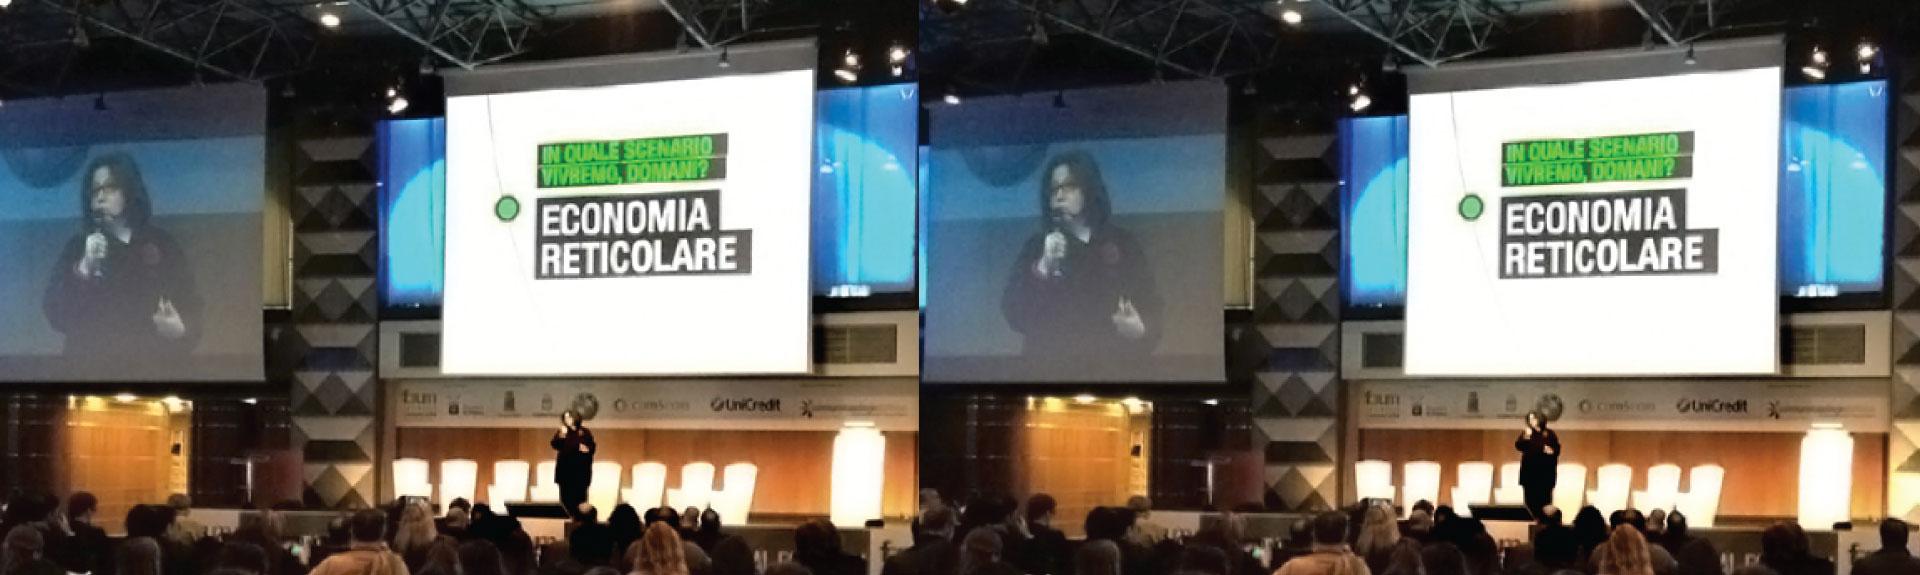 10/4: Weconomy al Communication Forum